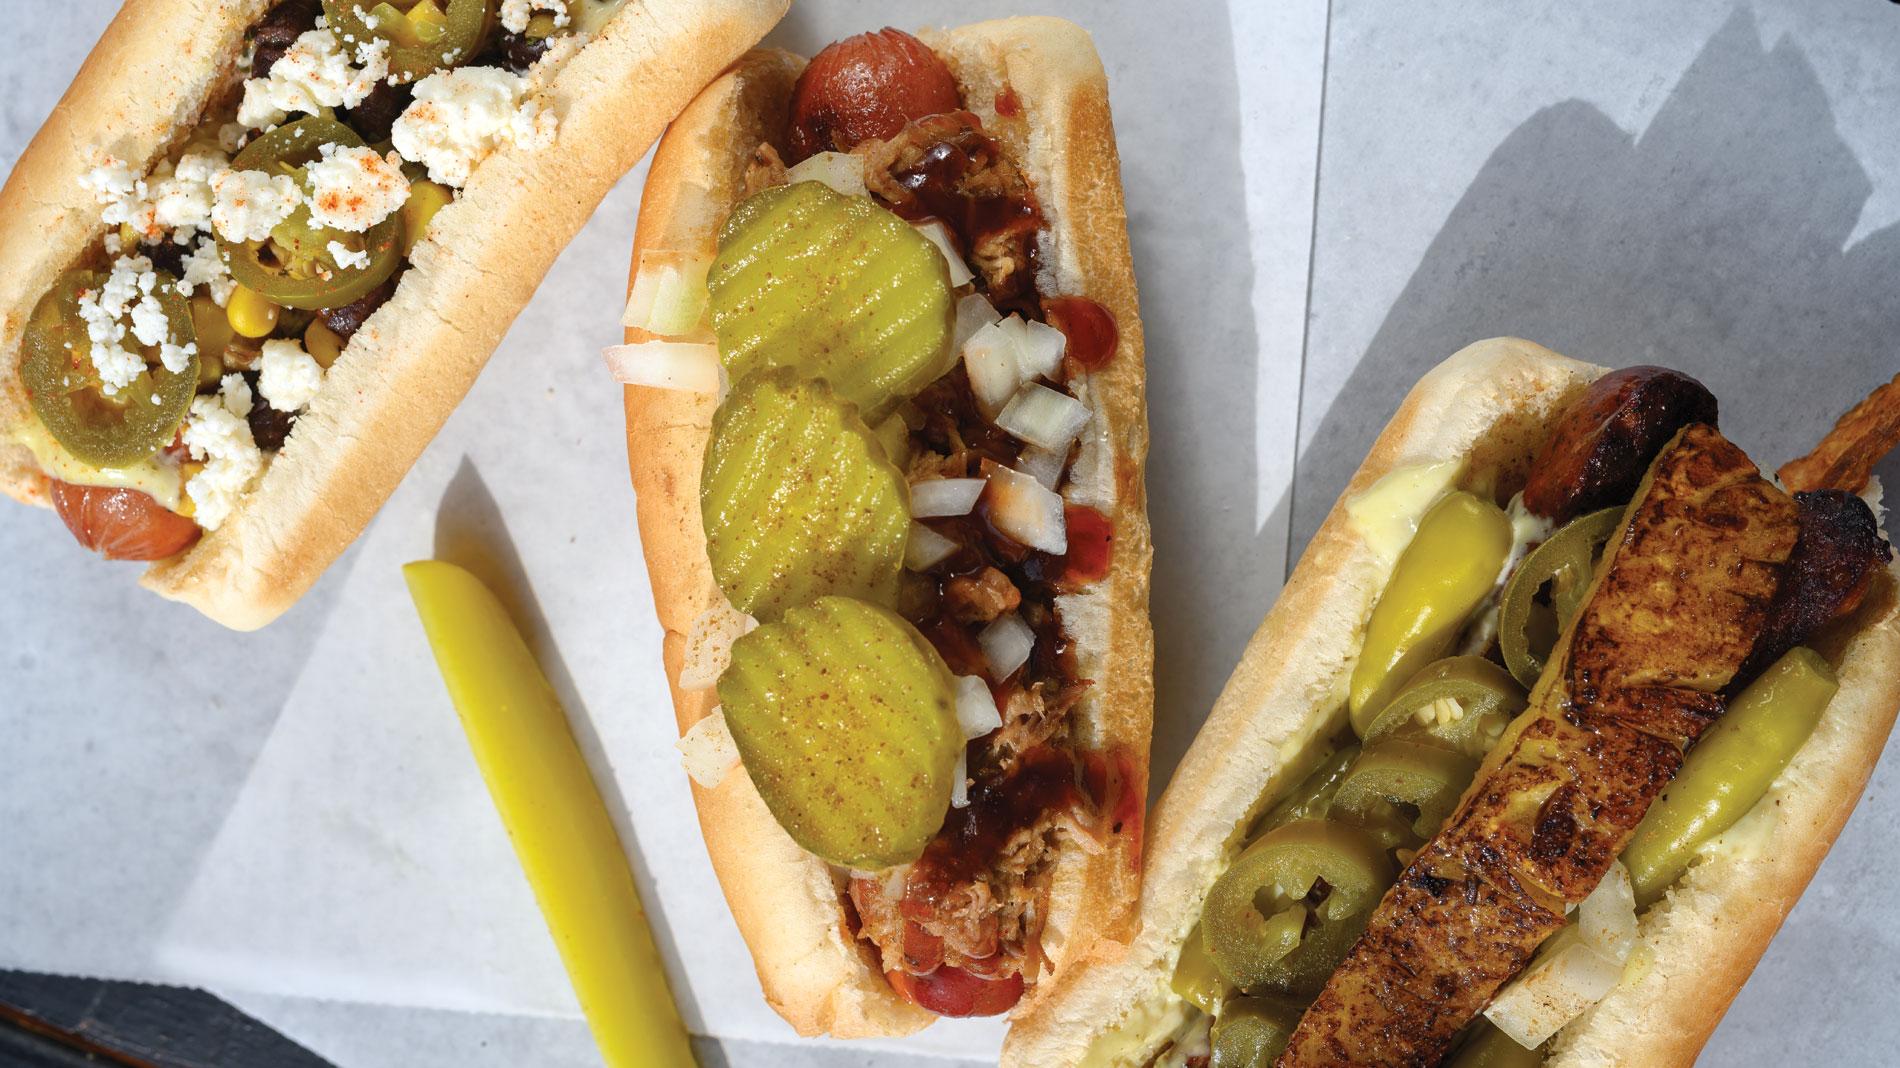 three dressed hot dogs